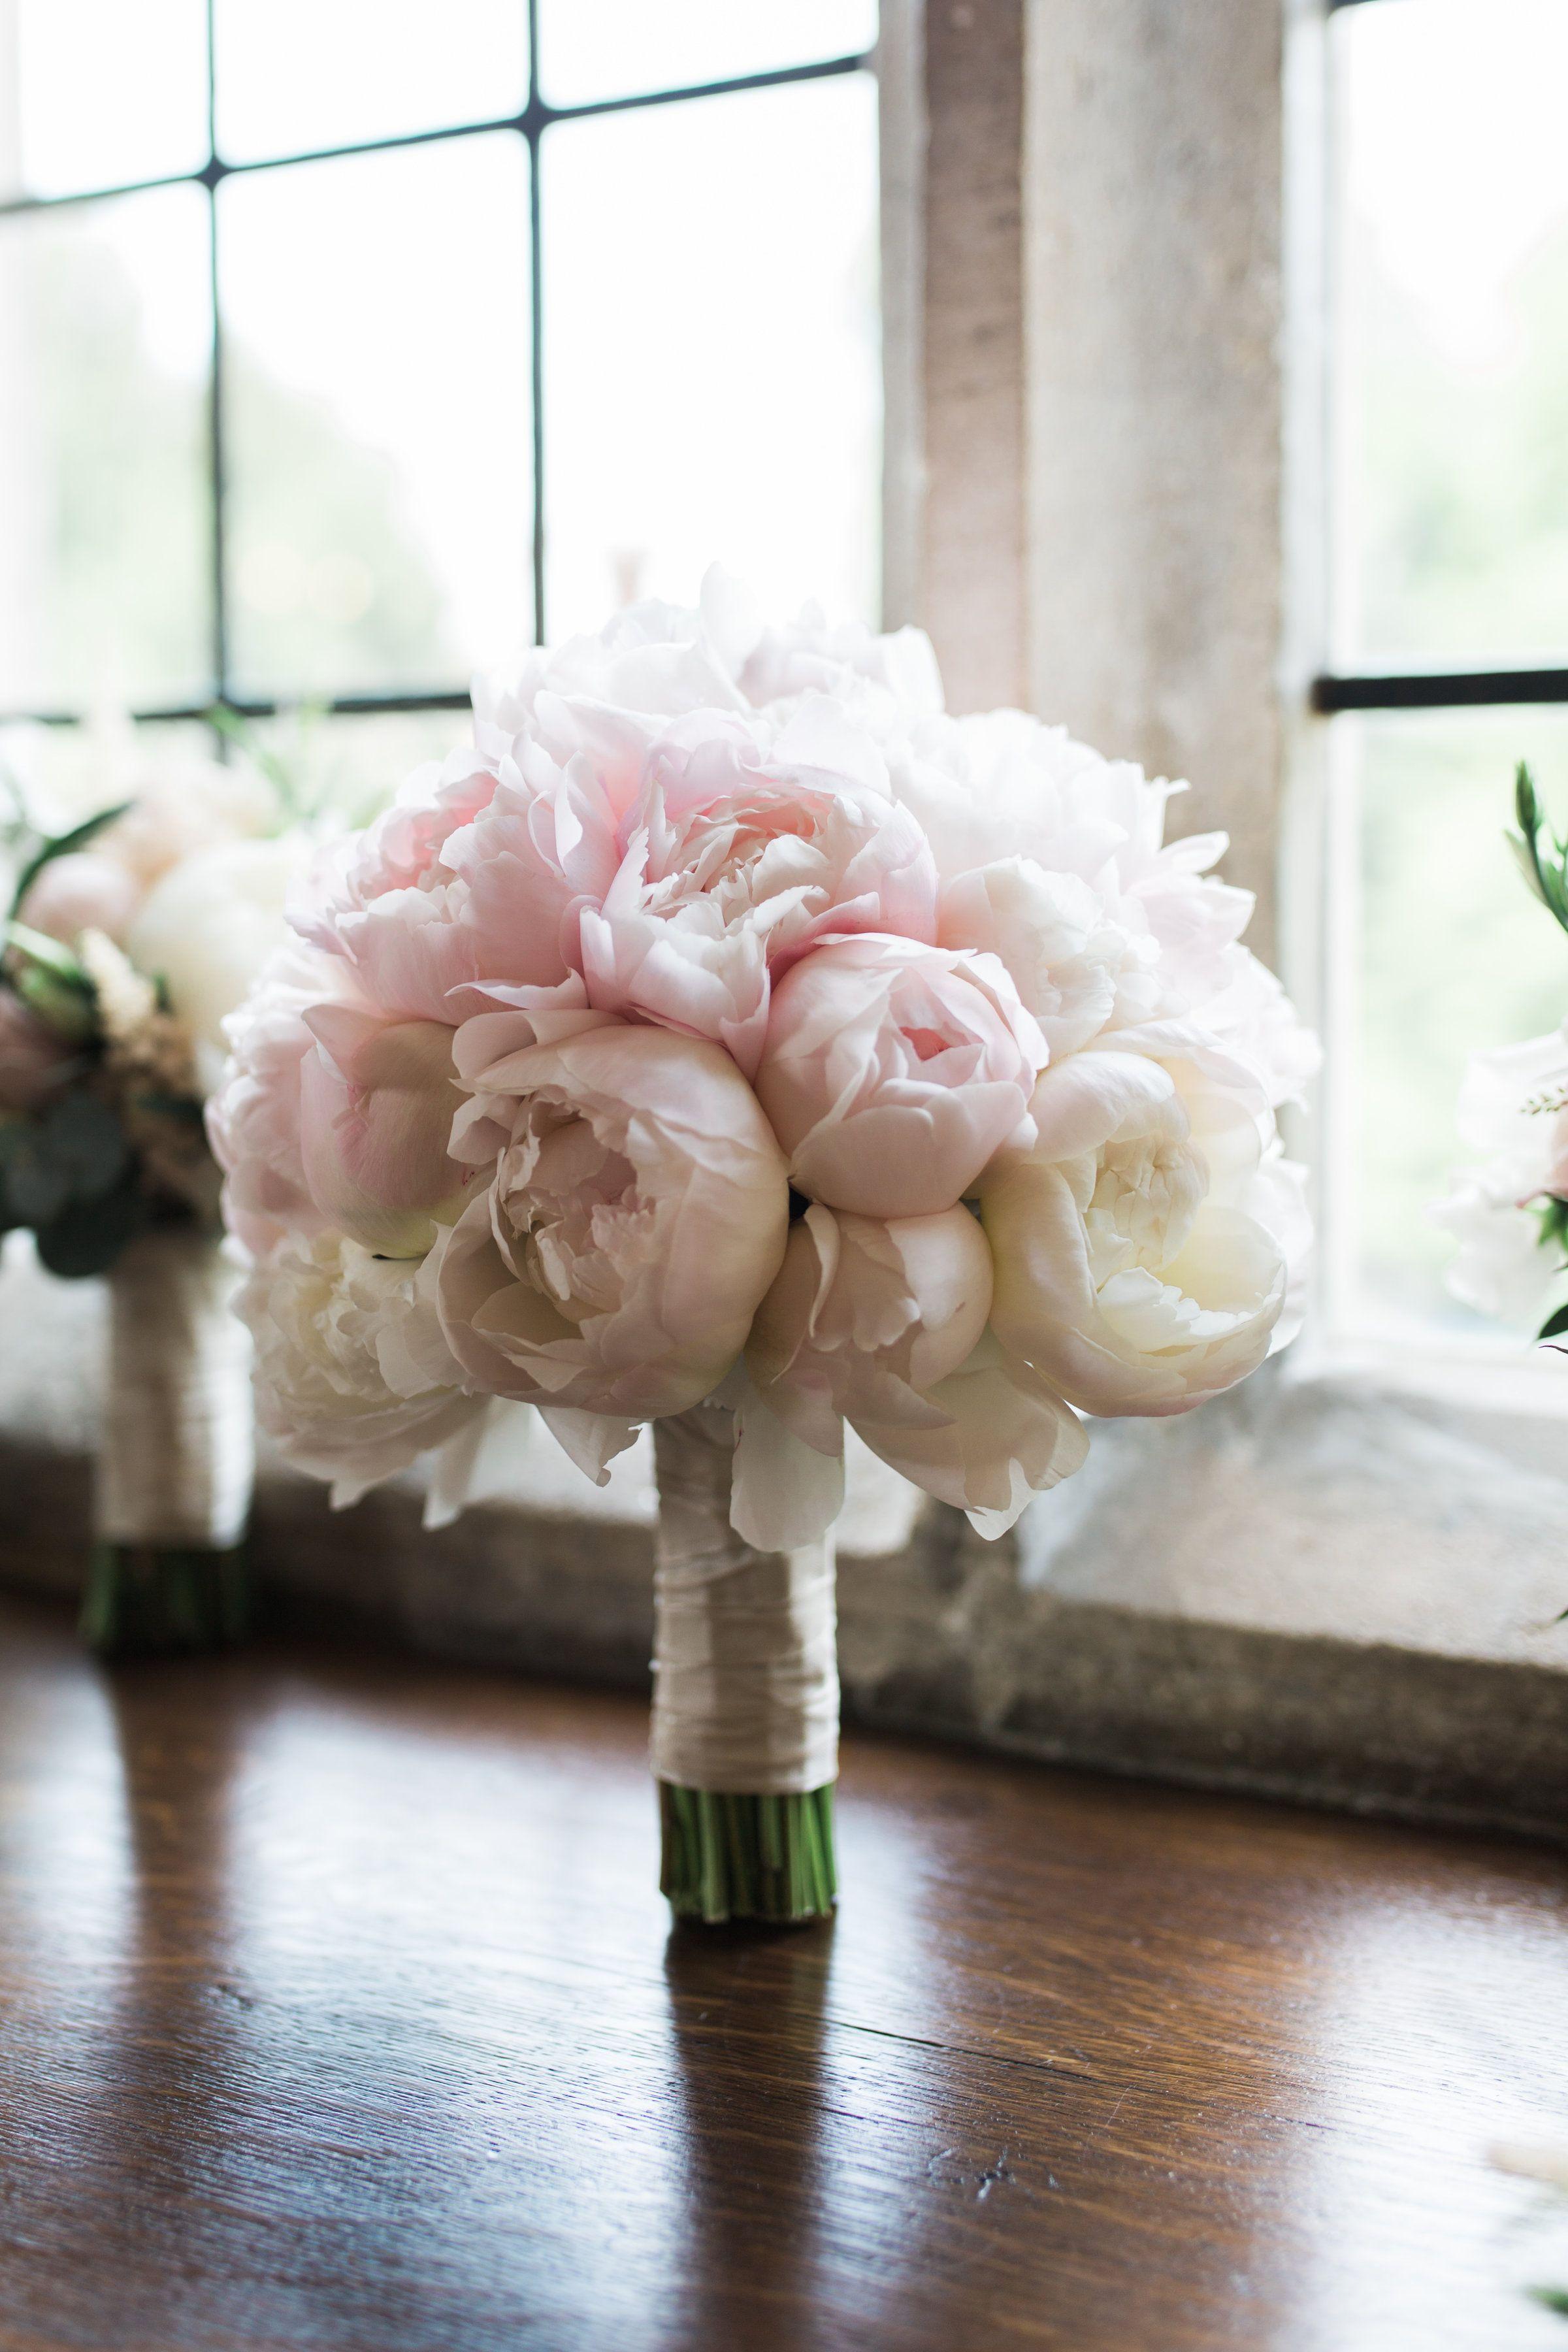 boutonniere bridesmaids keepsake bouquets bridal bouquet Wedding flowers Ny style floral bouquet summer wedding